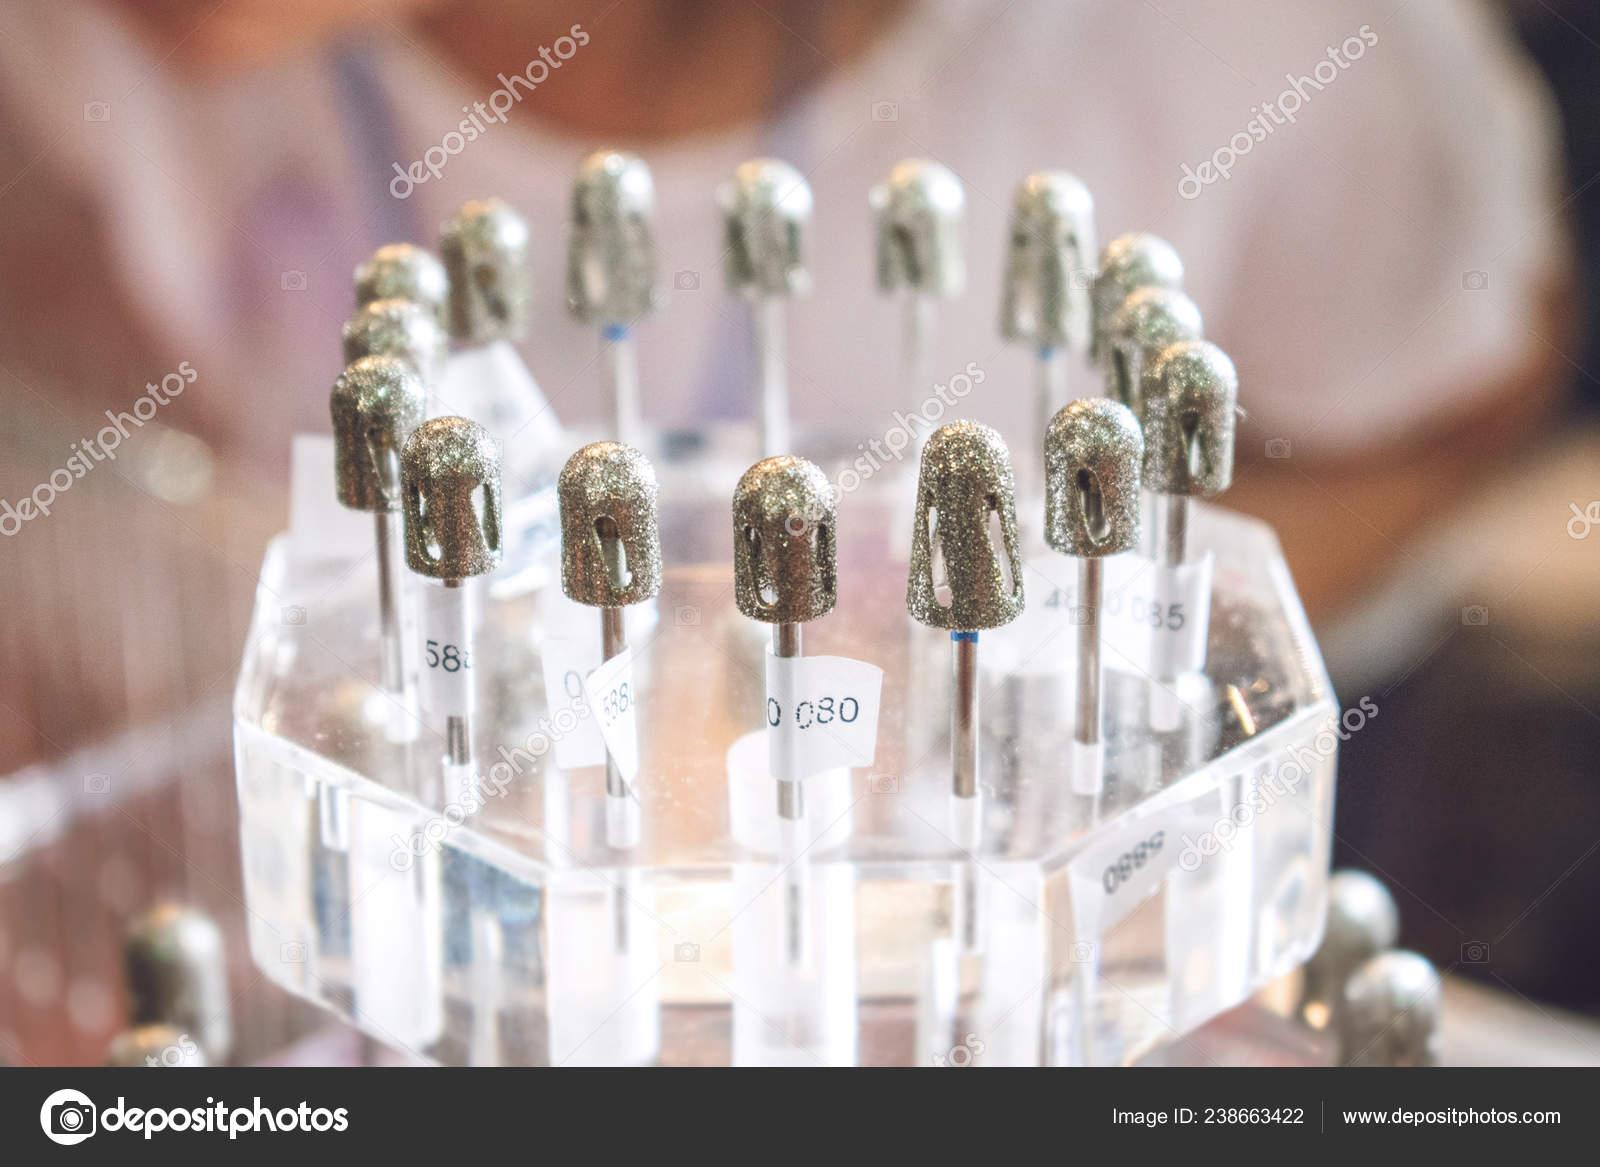 Diamond Cutters Manicure Nail Drill Bits Manicure Accessories Rotary ...